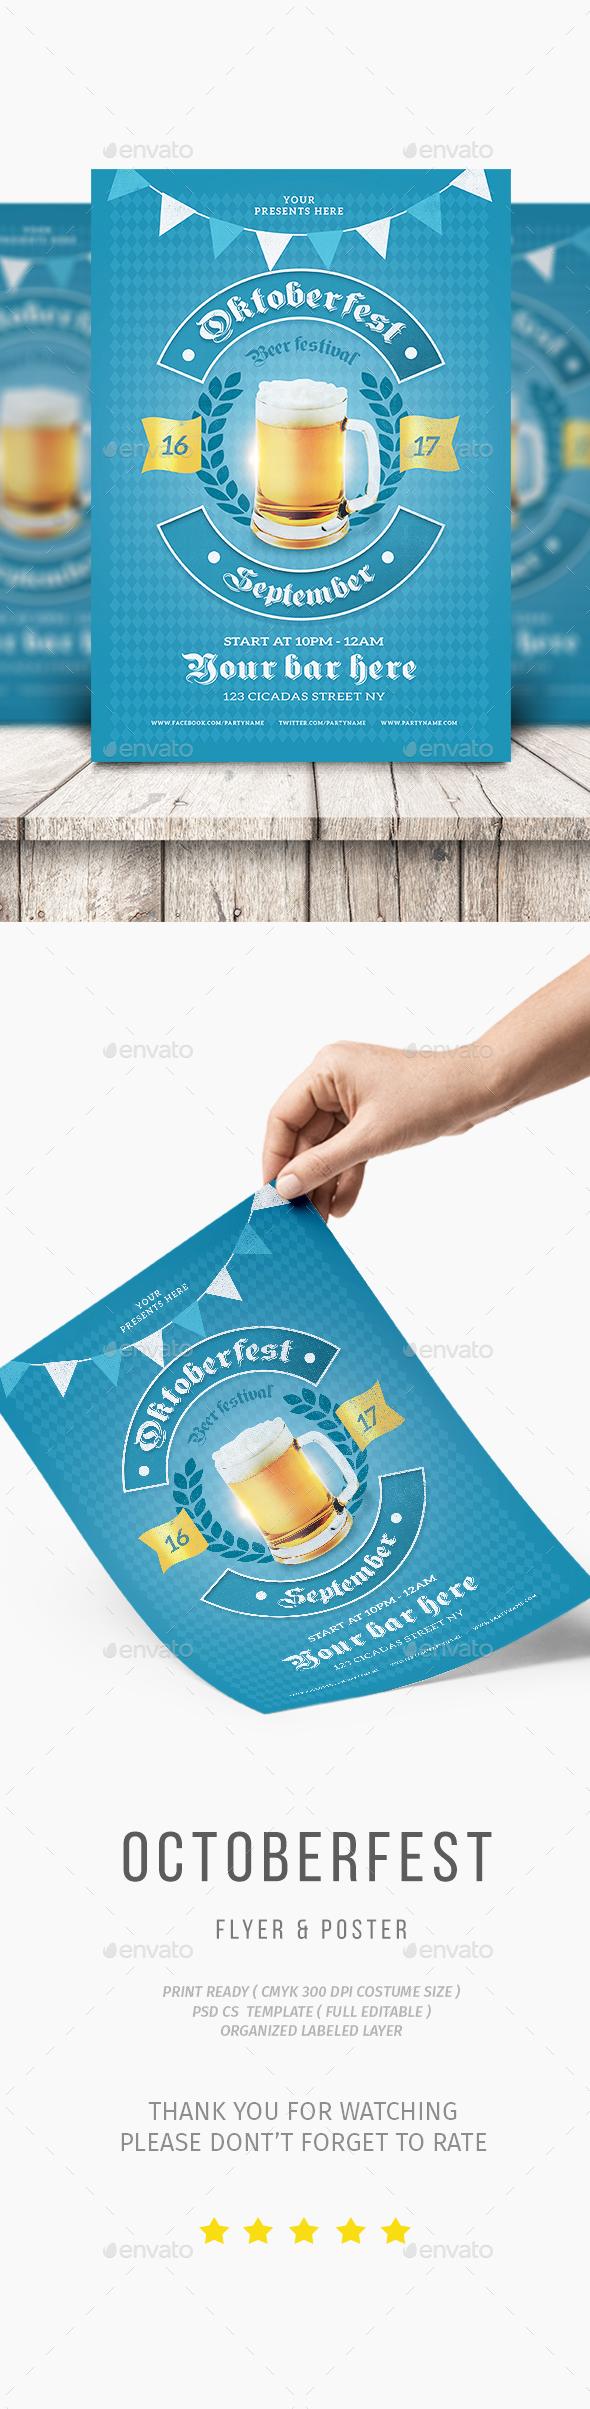 GraphicRiver Oktoberfest Flyer 20492049